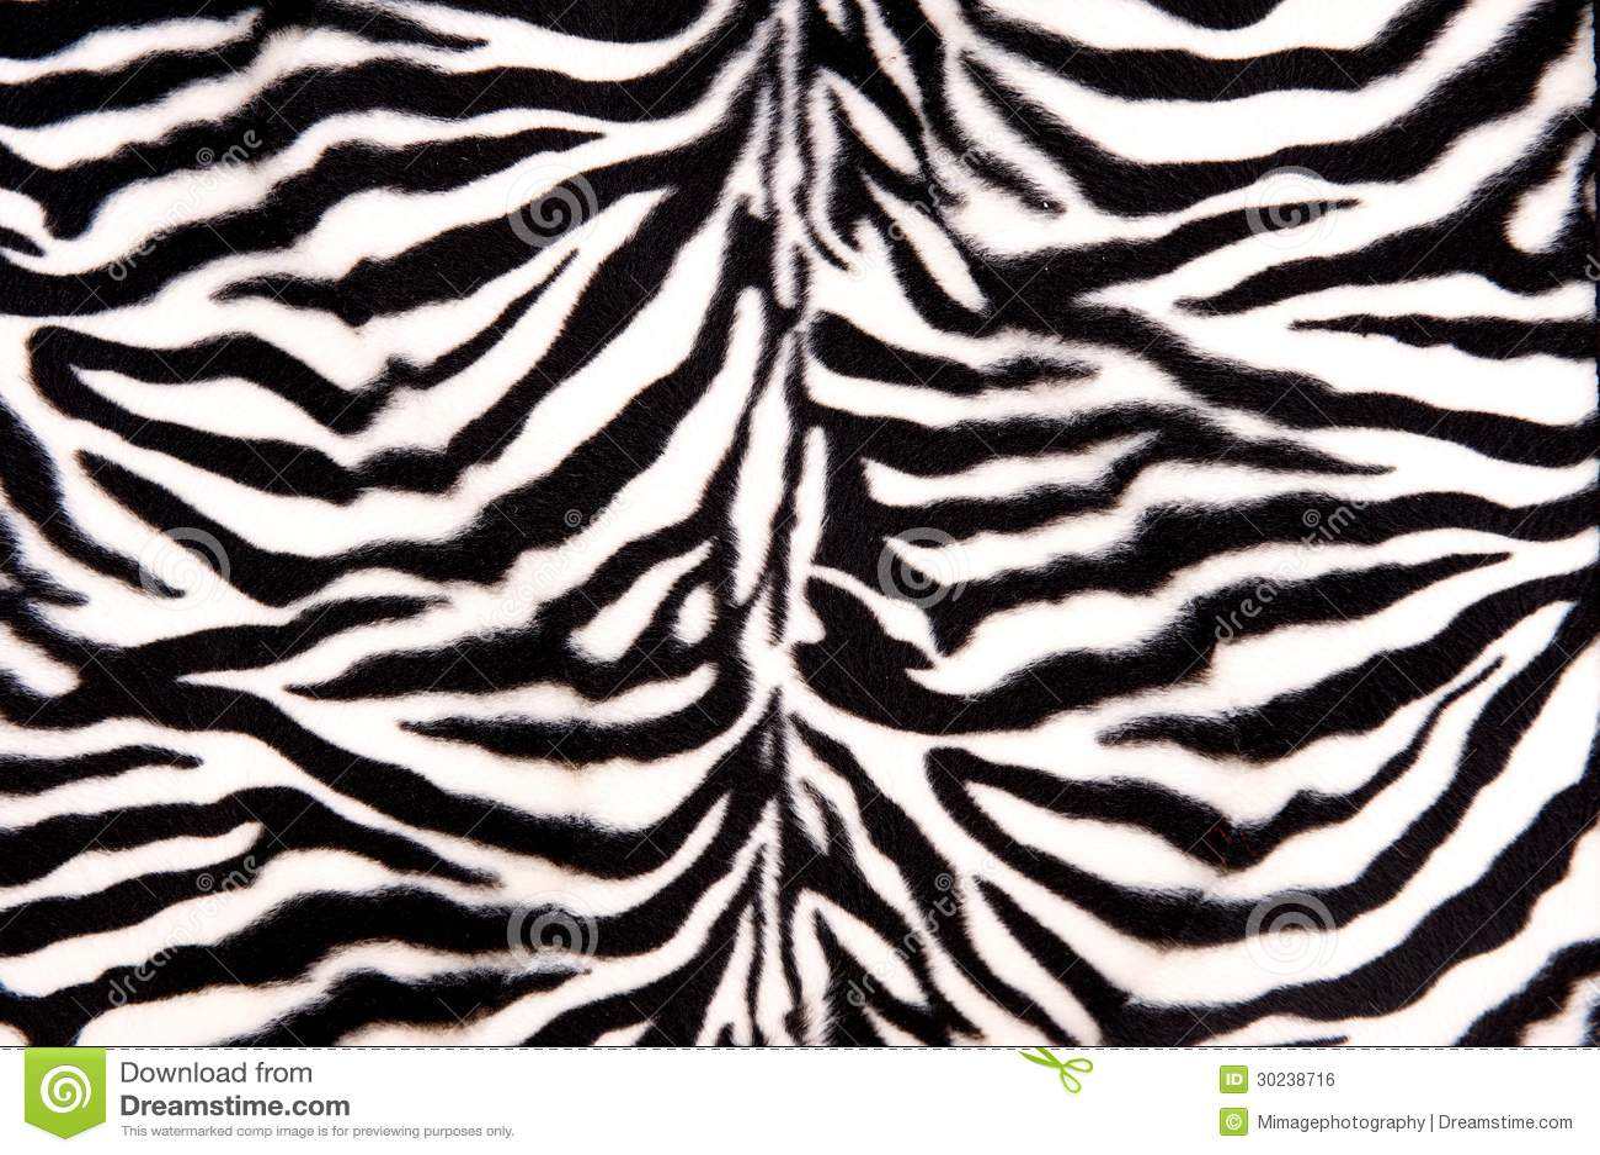 Aninimal Book: Black And White Zebra Pattern Stock Photo - Image of ...